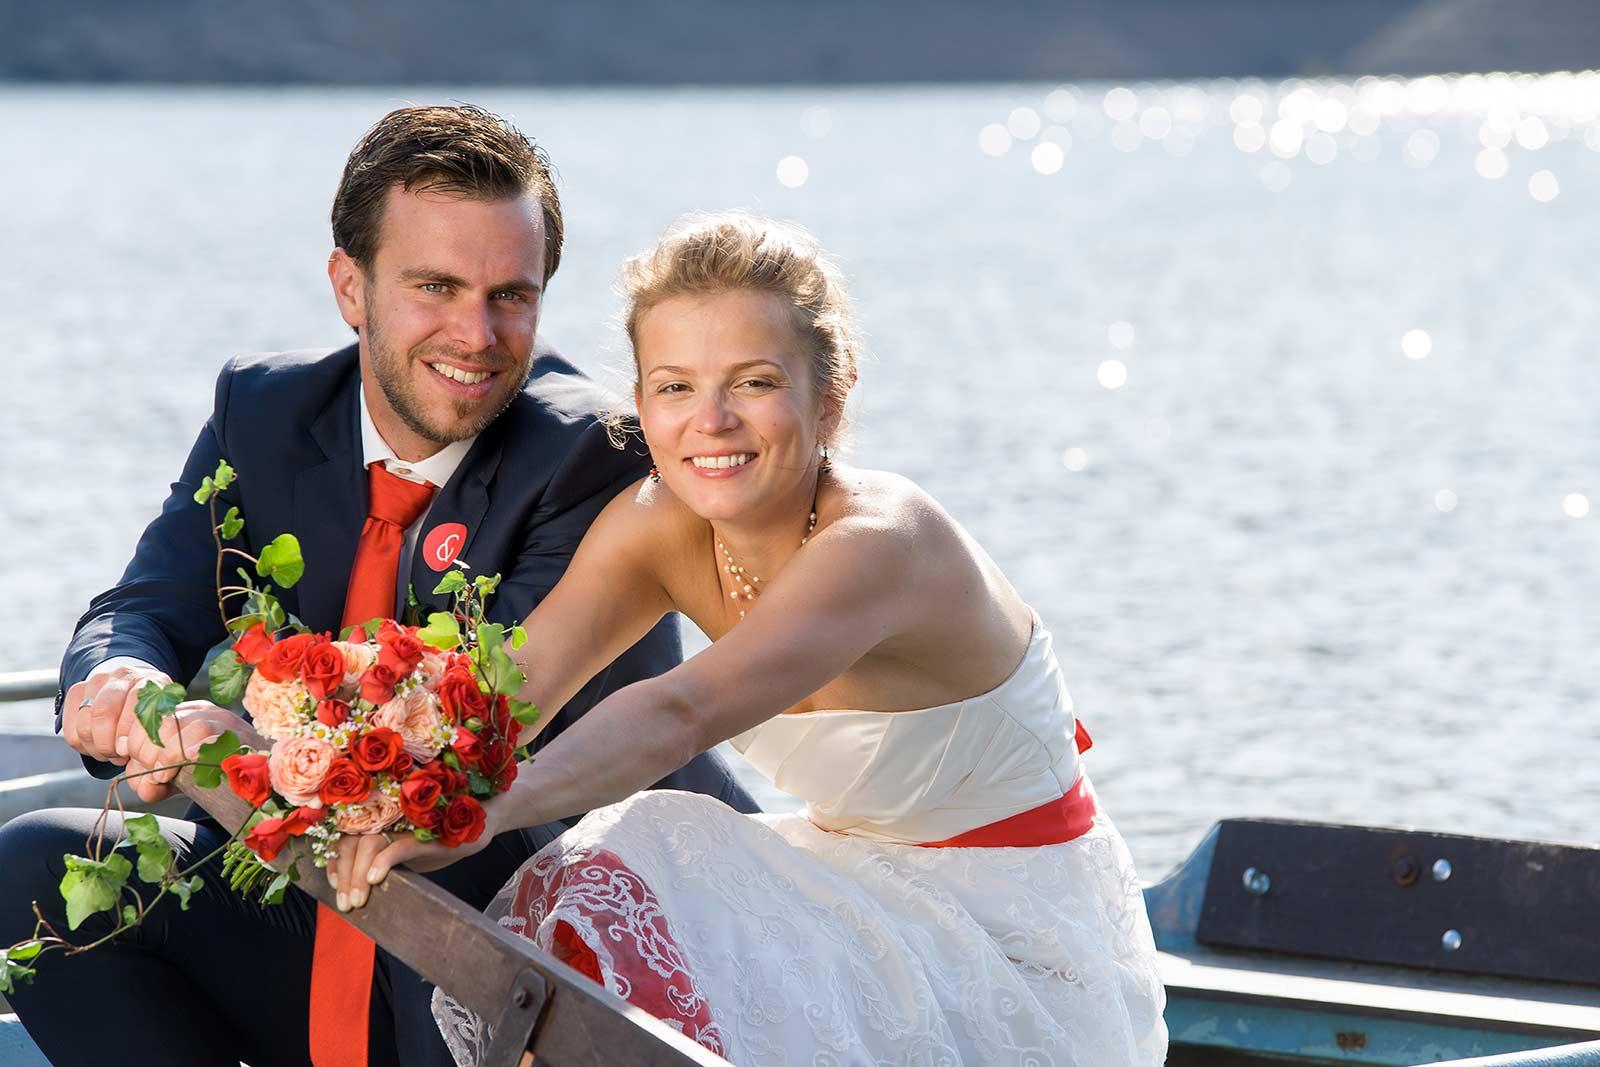 35 novomanzele na lodi svatebni fotograf ales motejl jizni cechy